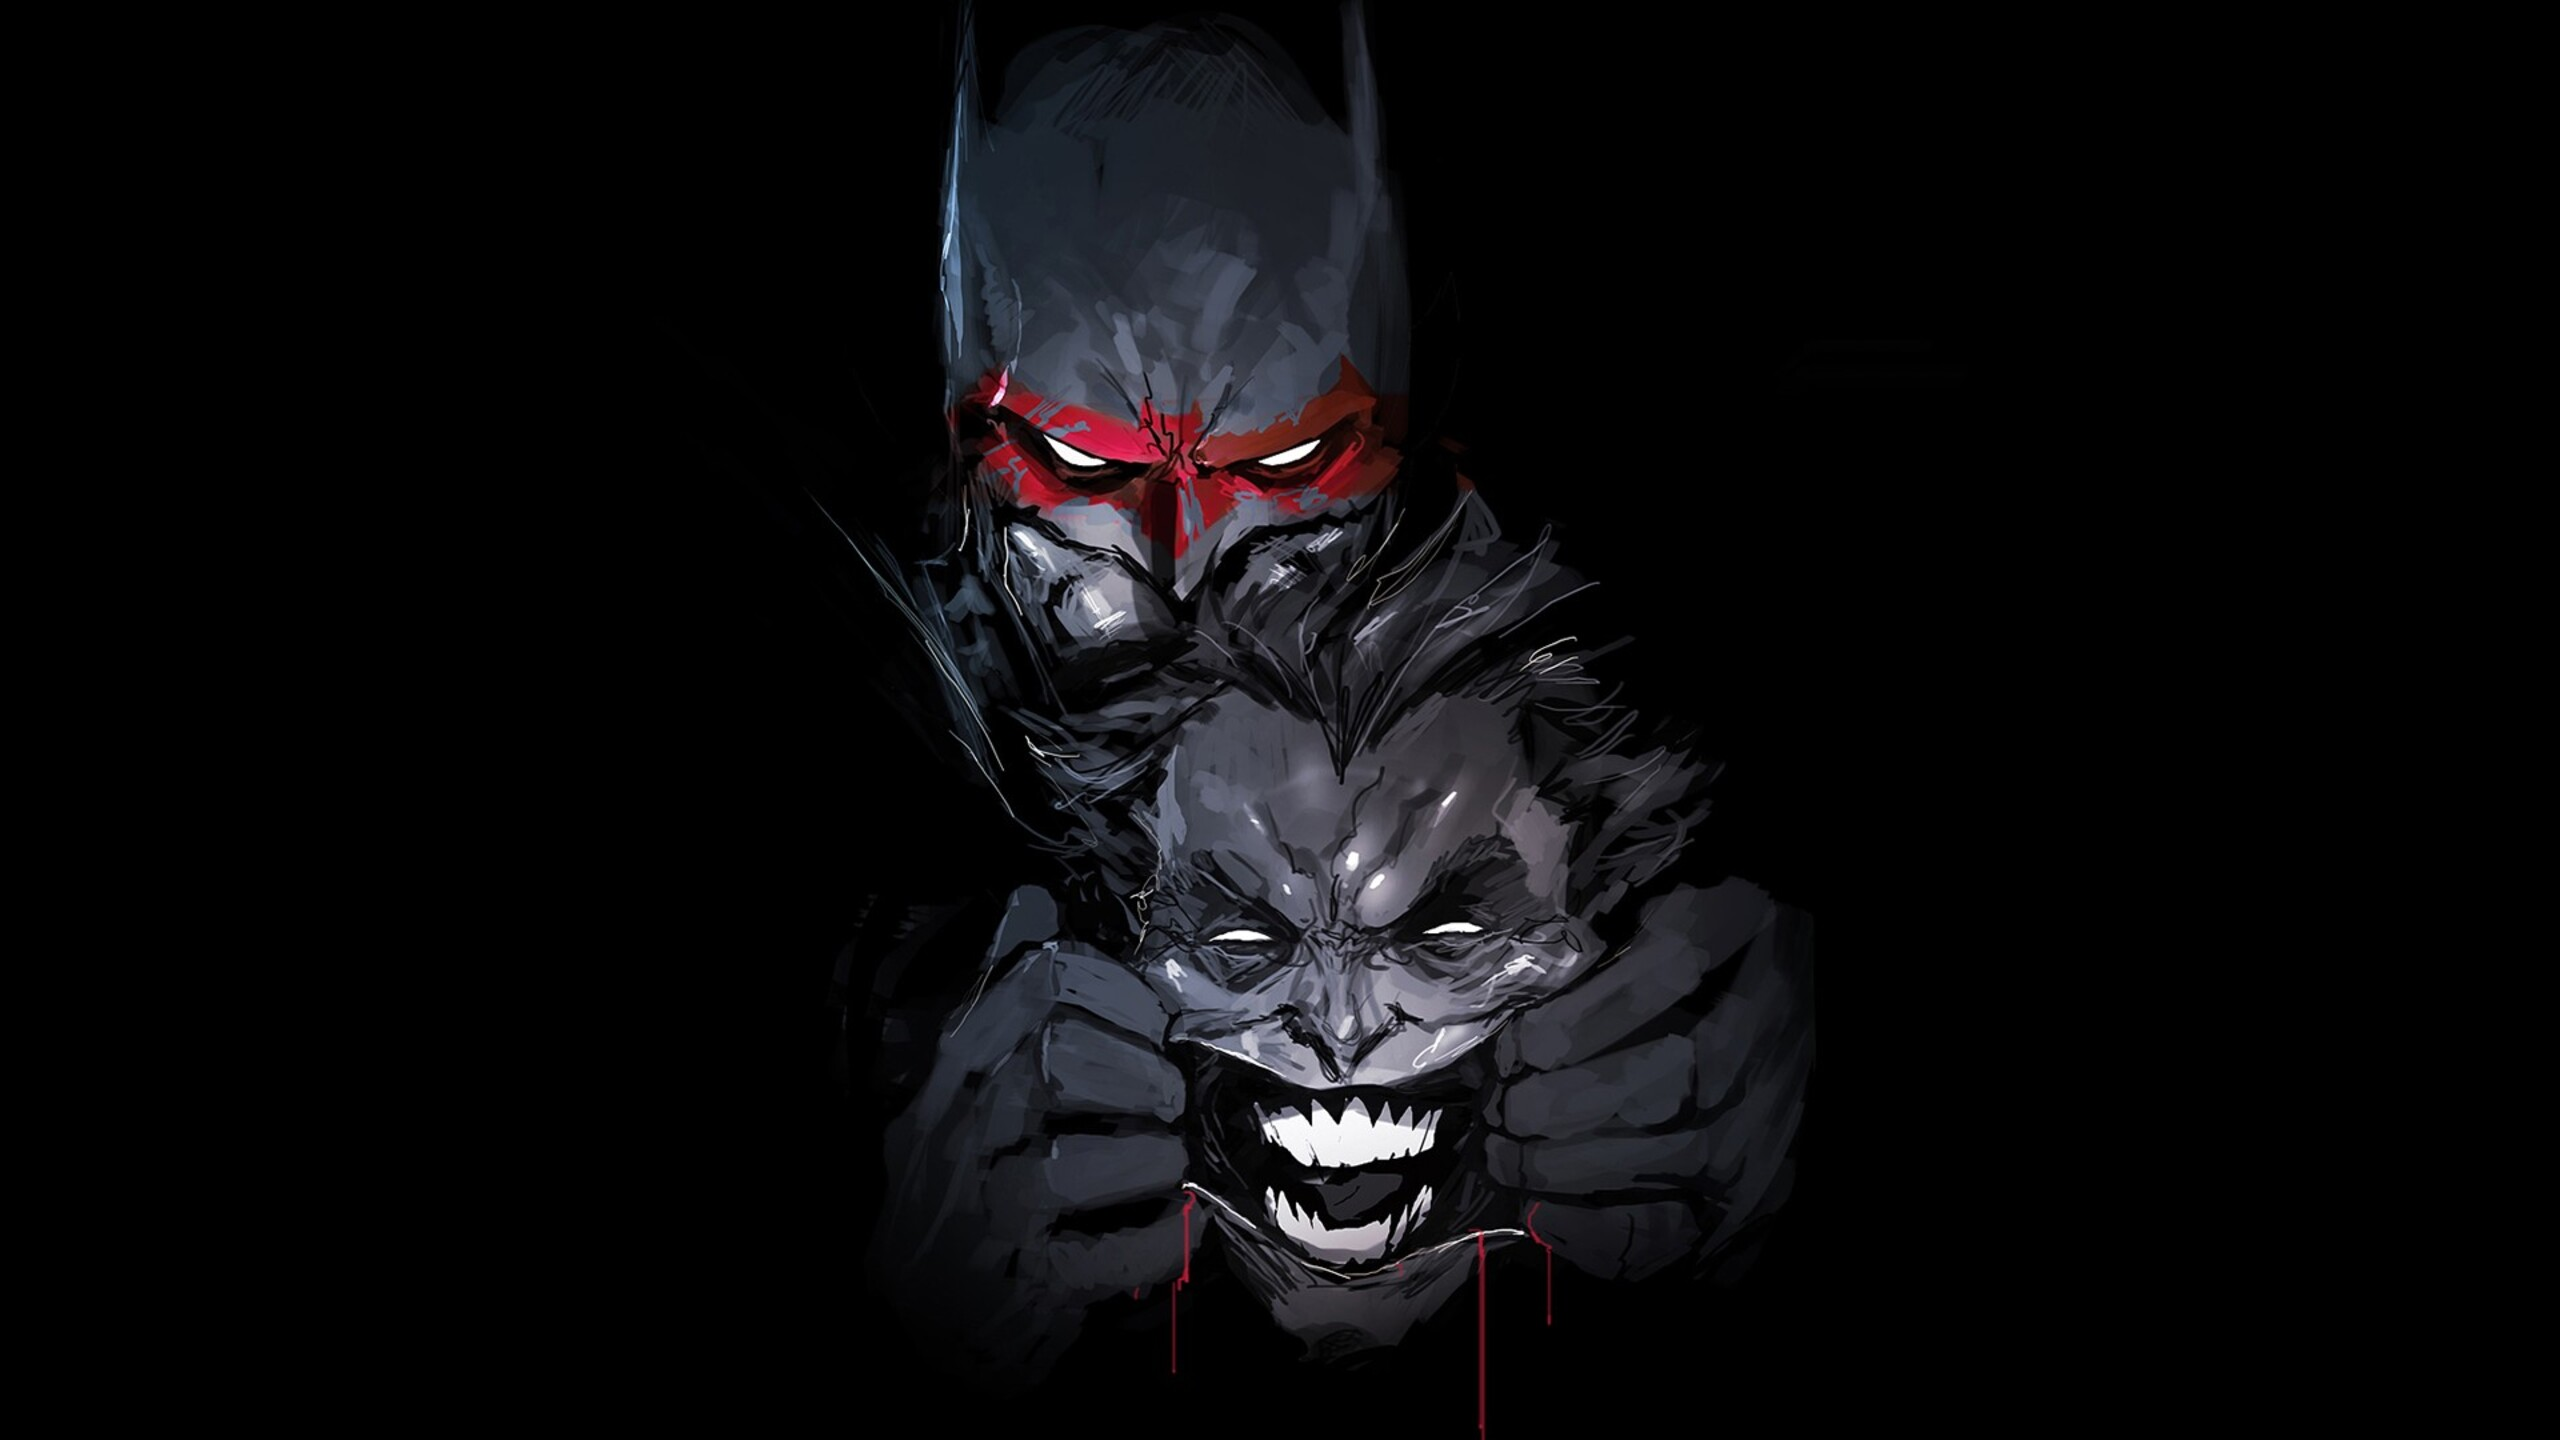 Fantastic Wallpaper Halloween Batman - batman-joker-artwork-new-2560x1440  You Should Have_494576.jpg